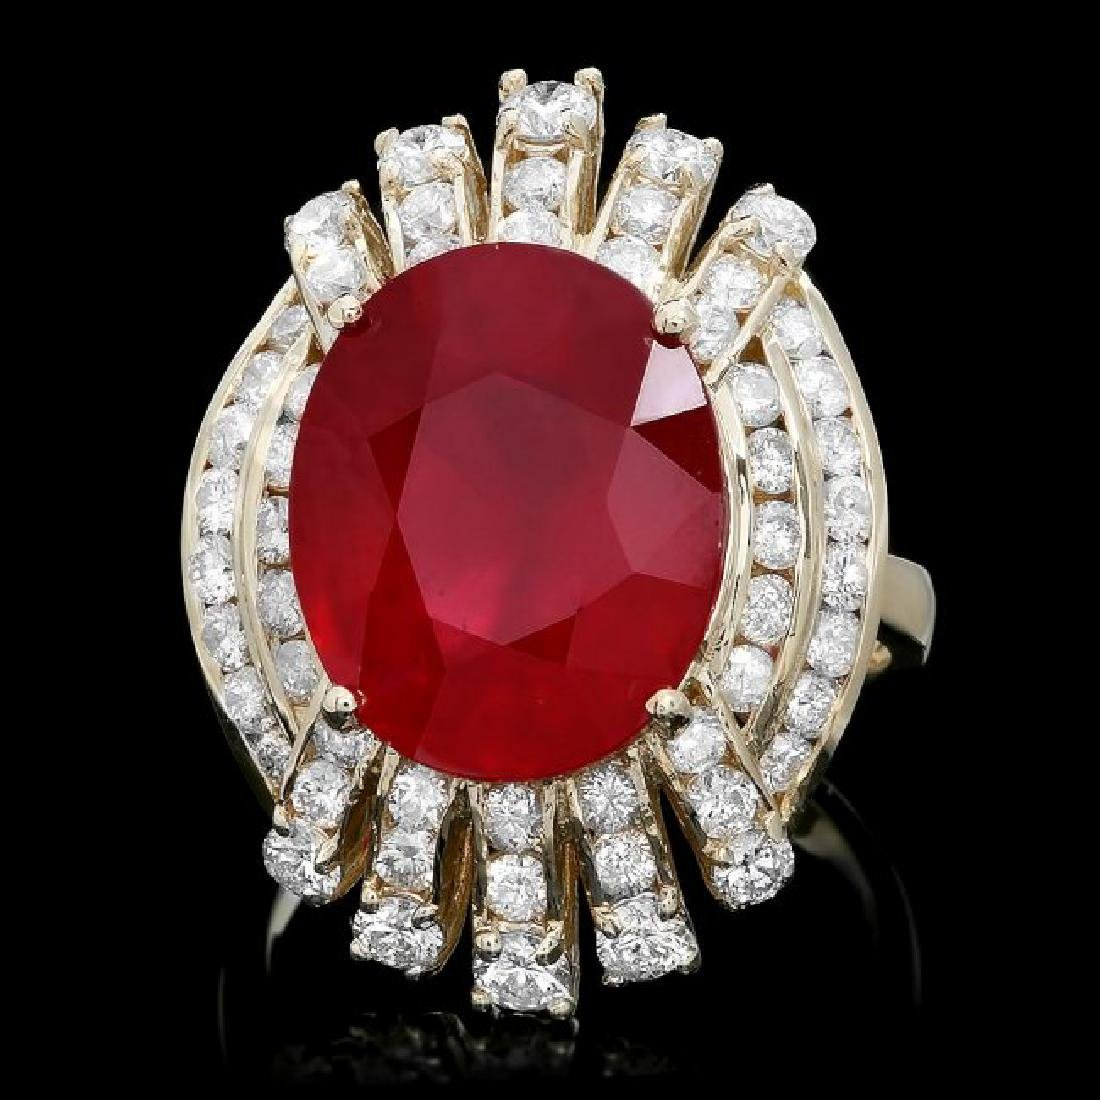 14k Yellow Gold 10.00ct Ruby 2.00ct Diamond Ring - 2